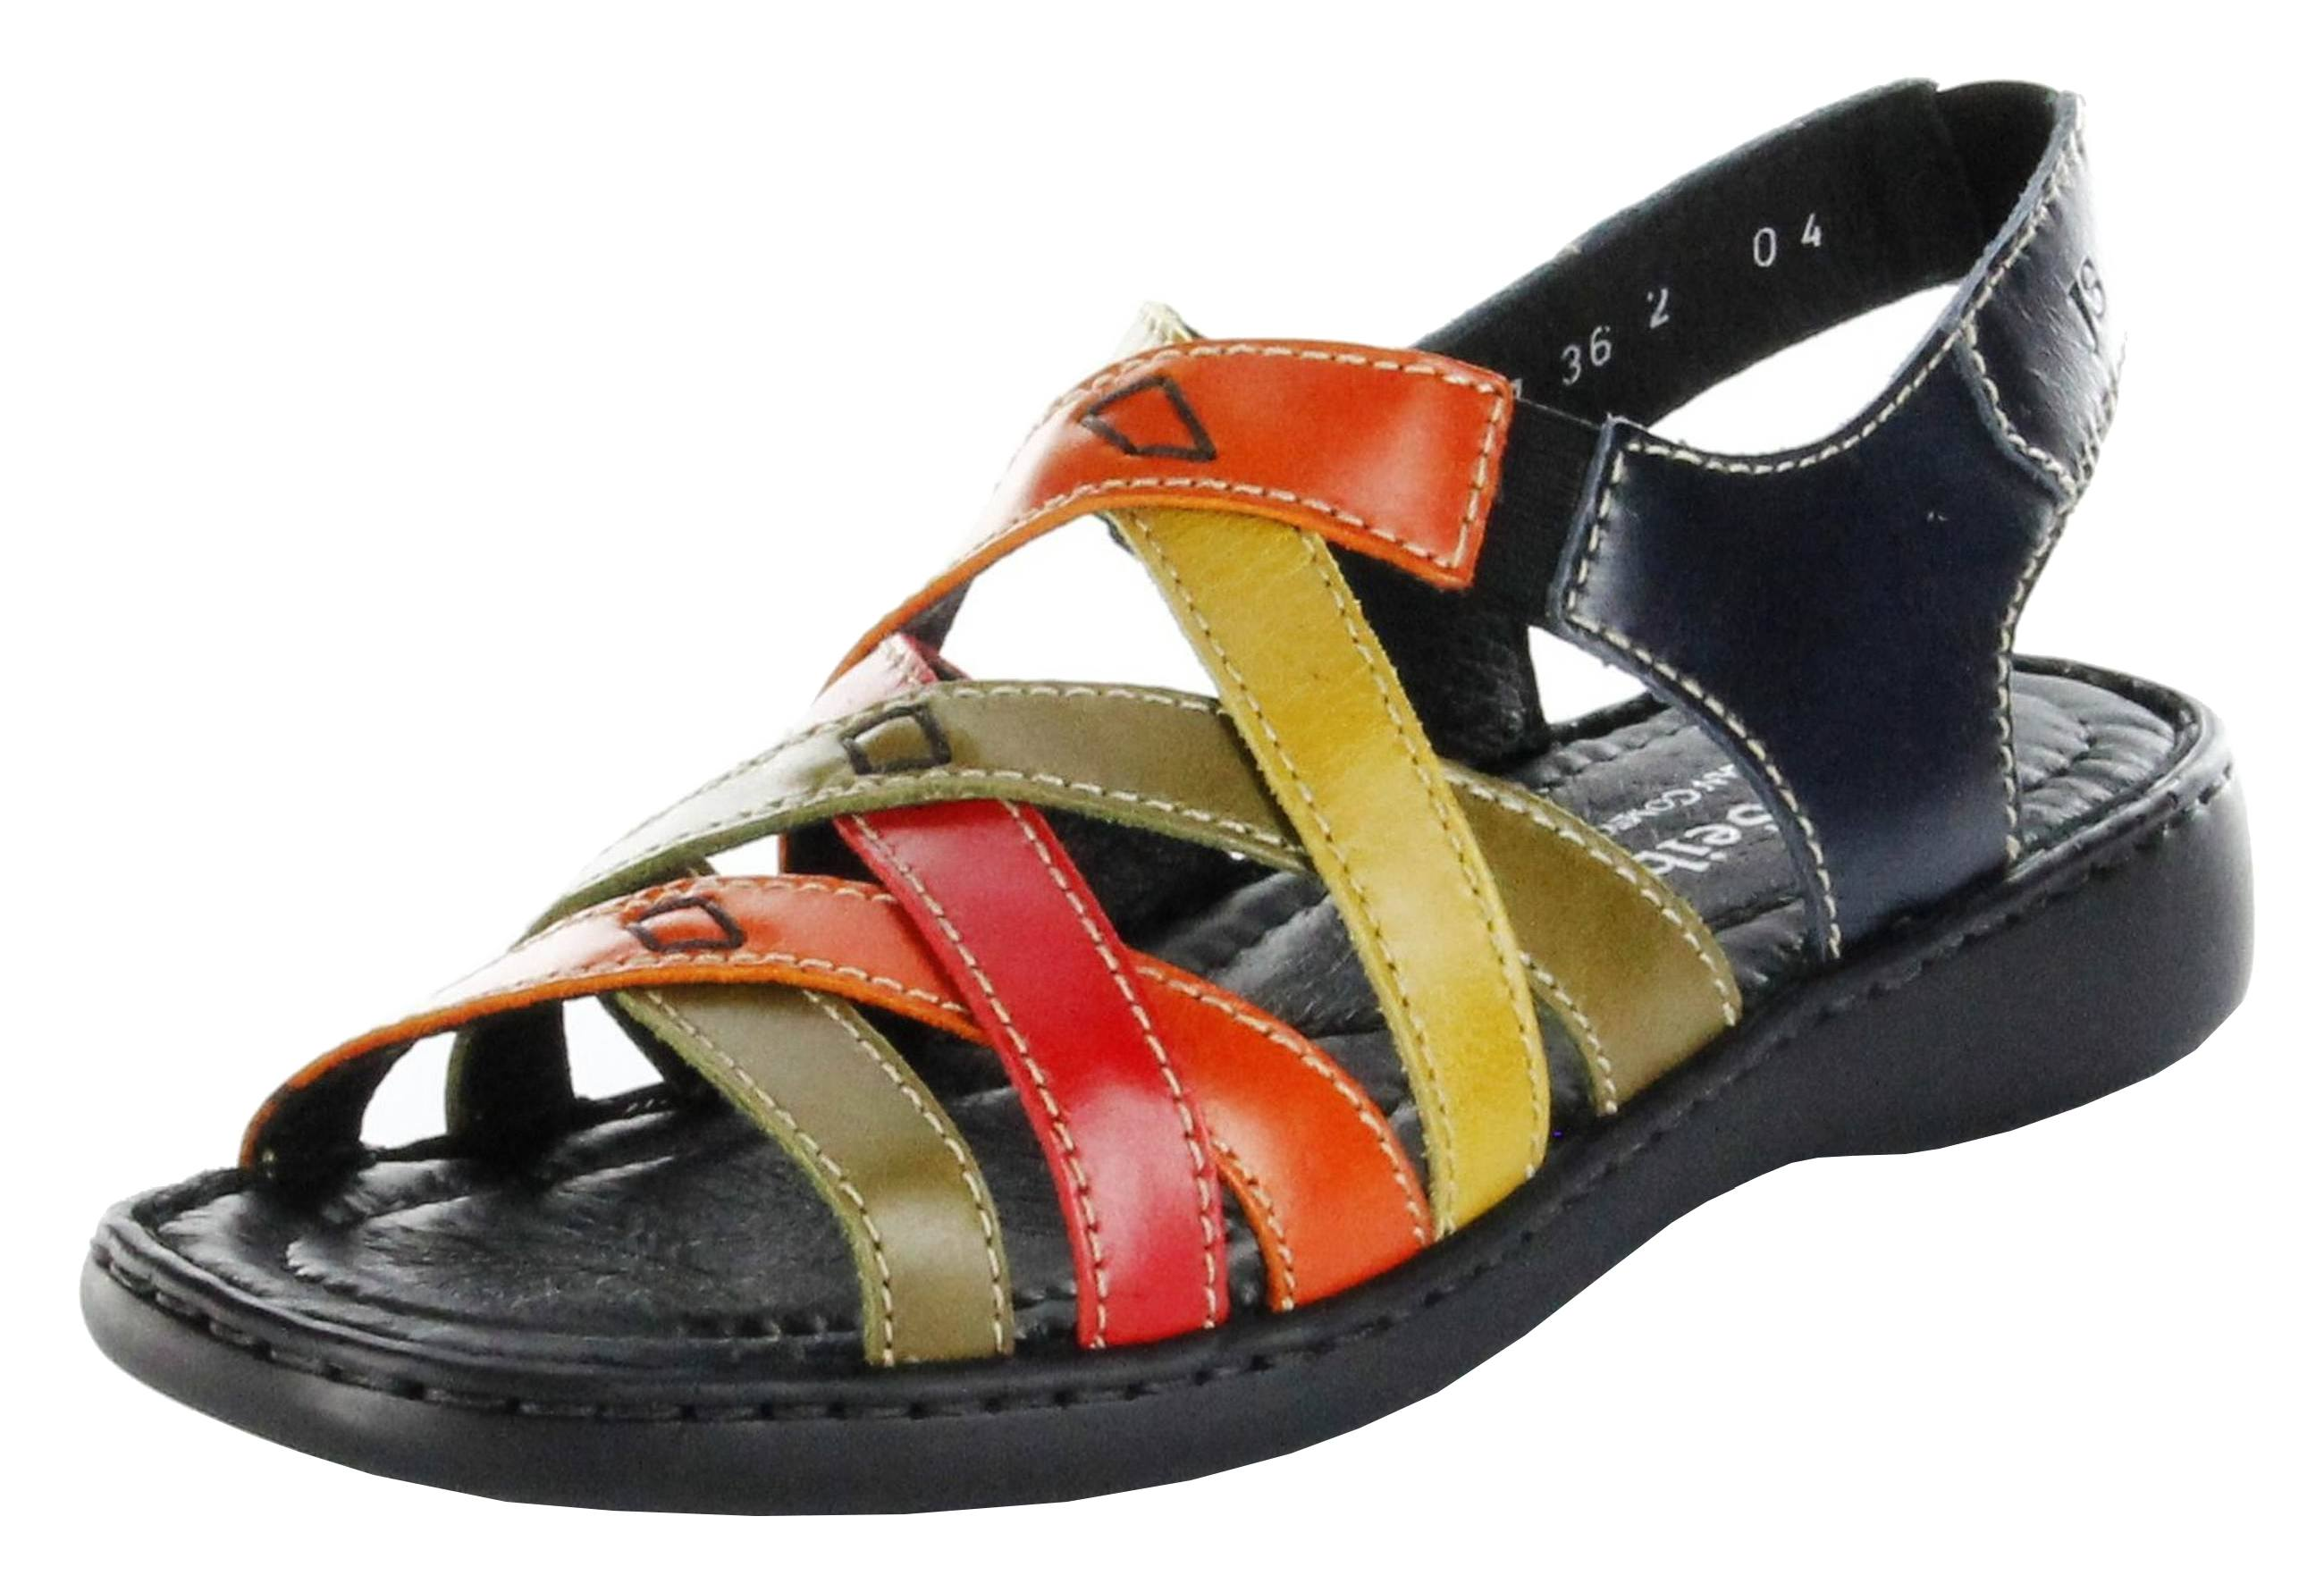 reputable site f507a 49835 Josef Seibel Sandaletten multicolor Lederdeck Keil Leder Damen Schuhe Lisa  03